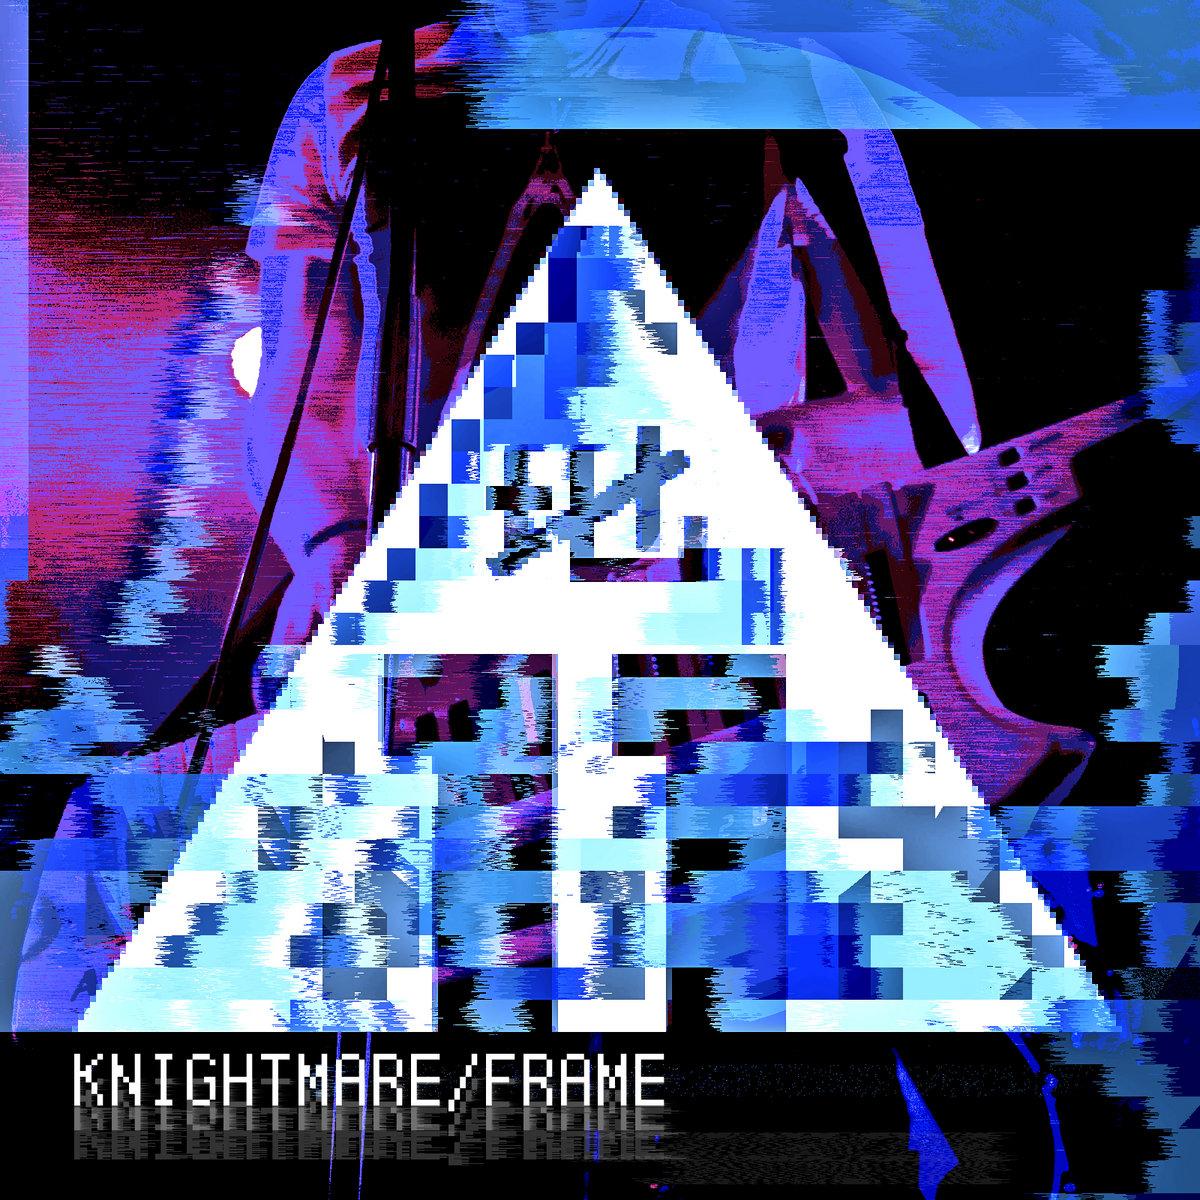 Knightmare Frame - Nightcore | FaxingMars: faxingmars.bandcamp.com/track/knightmare-frame-nightcore